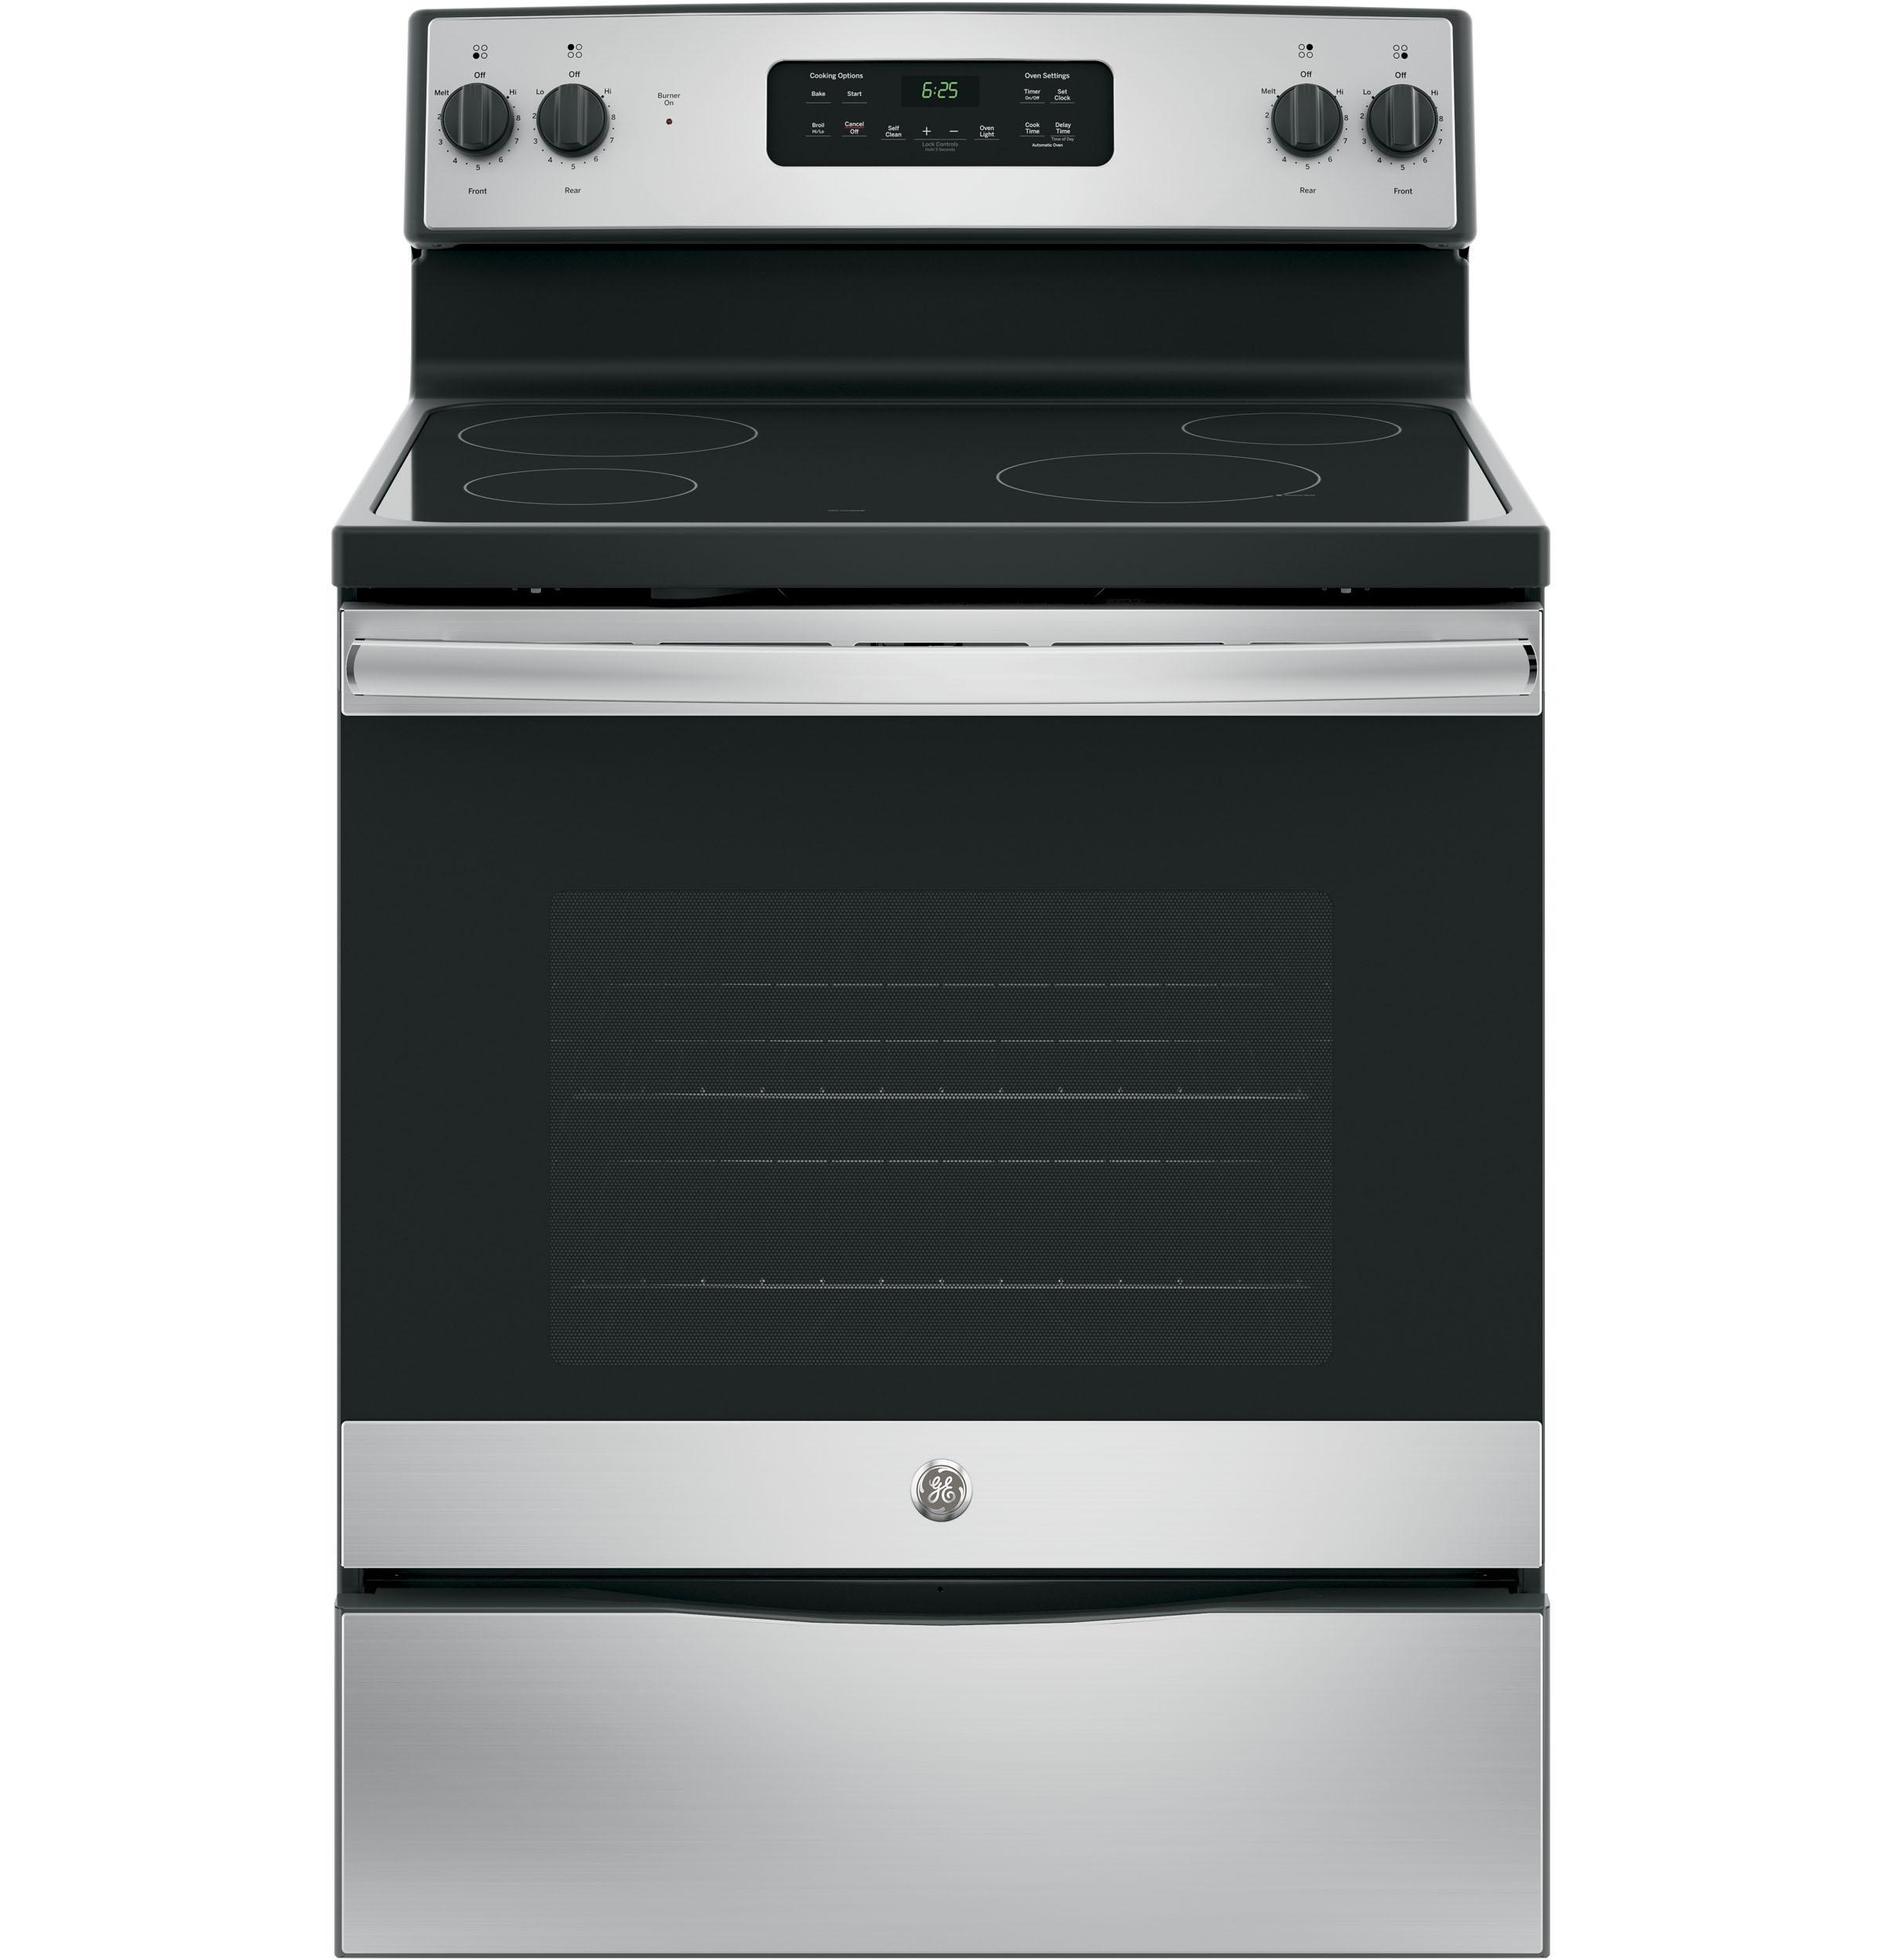 GE Appliances JB625RKSS, Glass Cooktop, Stainless Steel